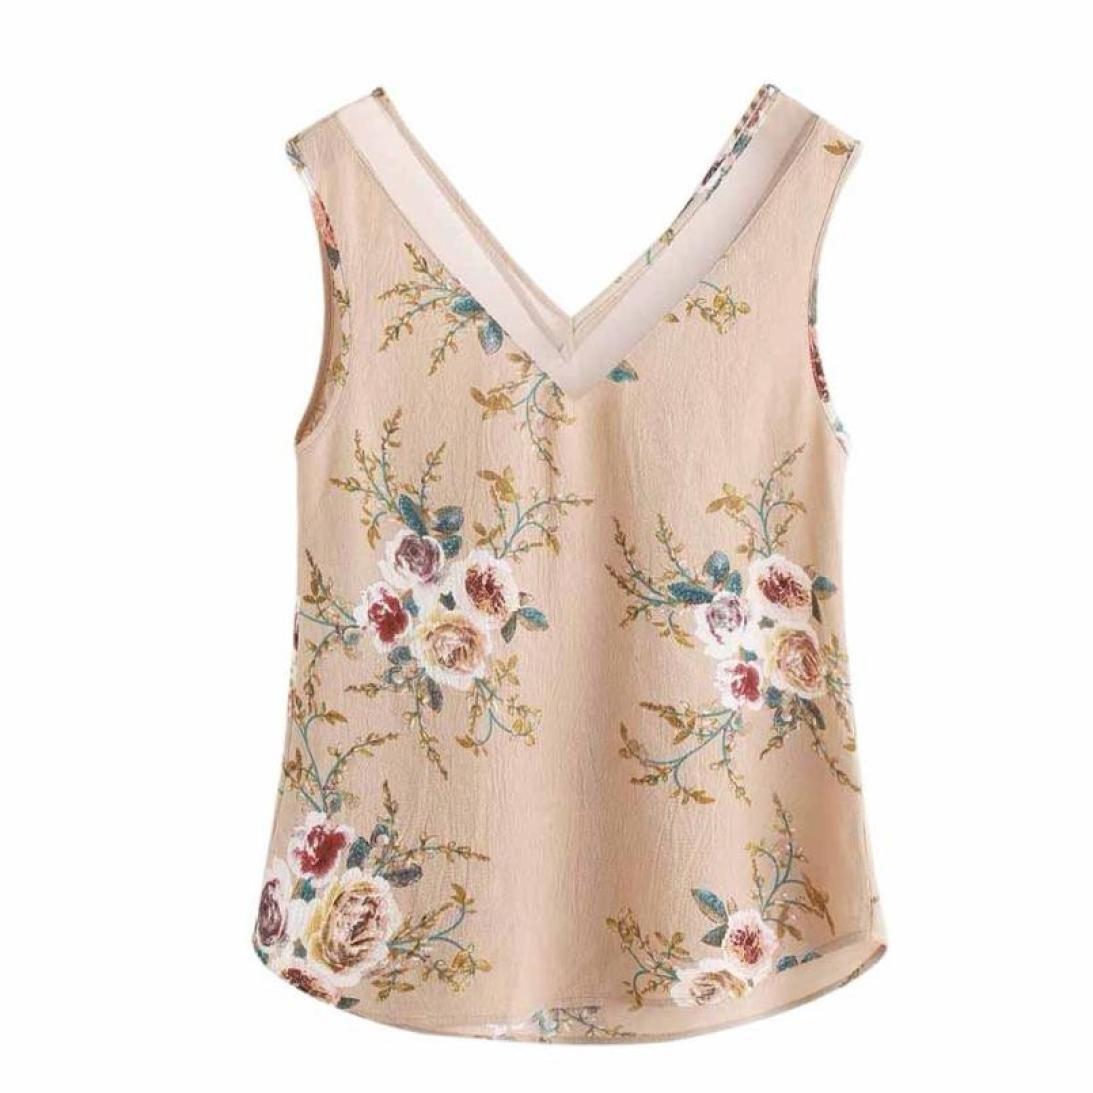 NREALY Chiffon Women Floral Casual Sleeveless Crop Top Vest Tank Shirt Blouse Cami Top (S, Khaki)